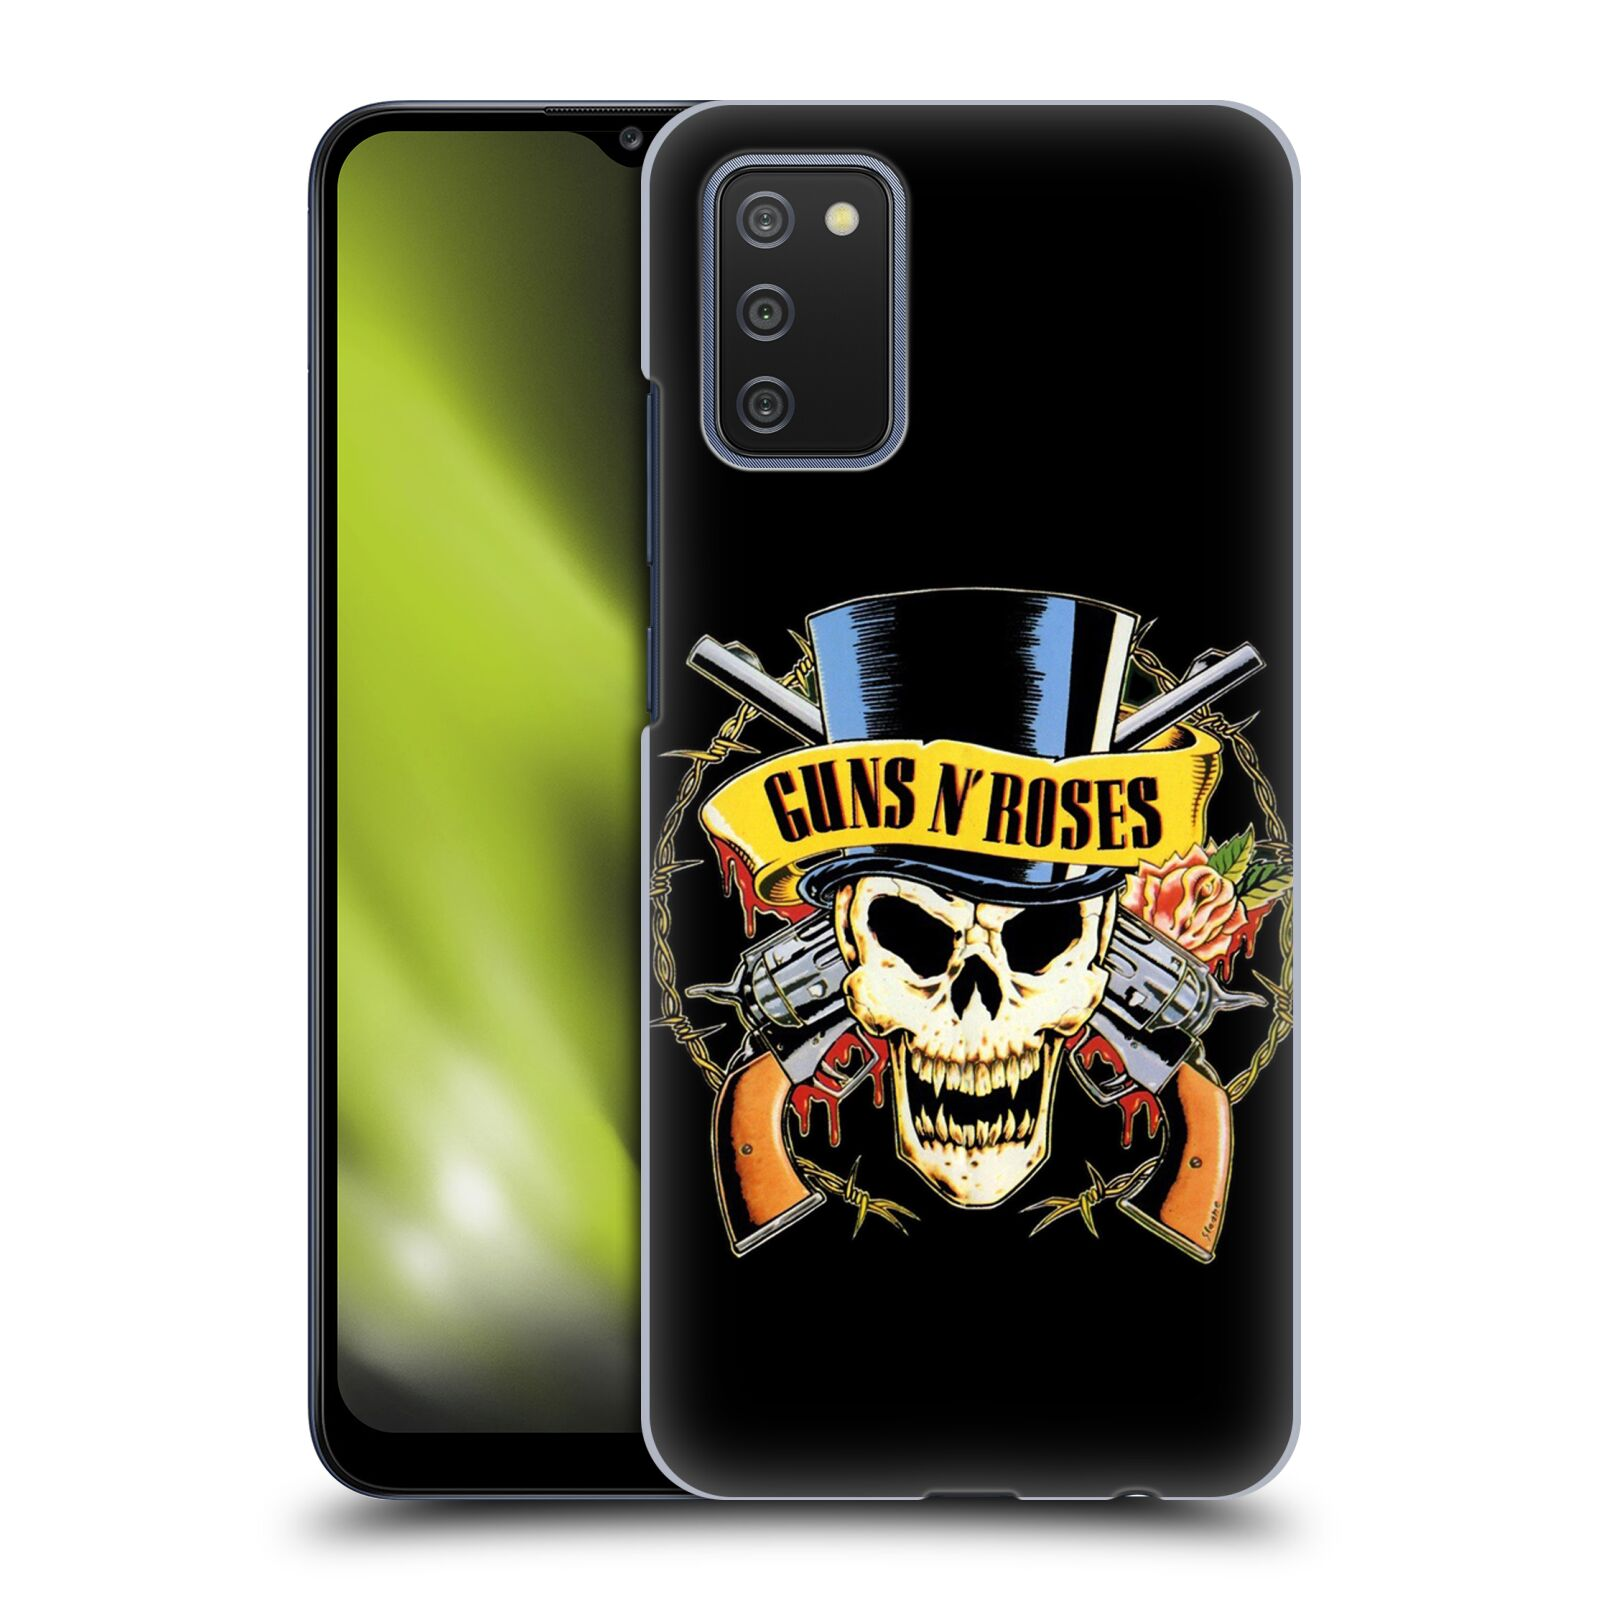 Plastové pouzdro na mobil Samsung Galaxy A02s - Head Case - Guns N' Roses - Lebka